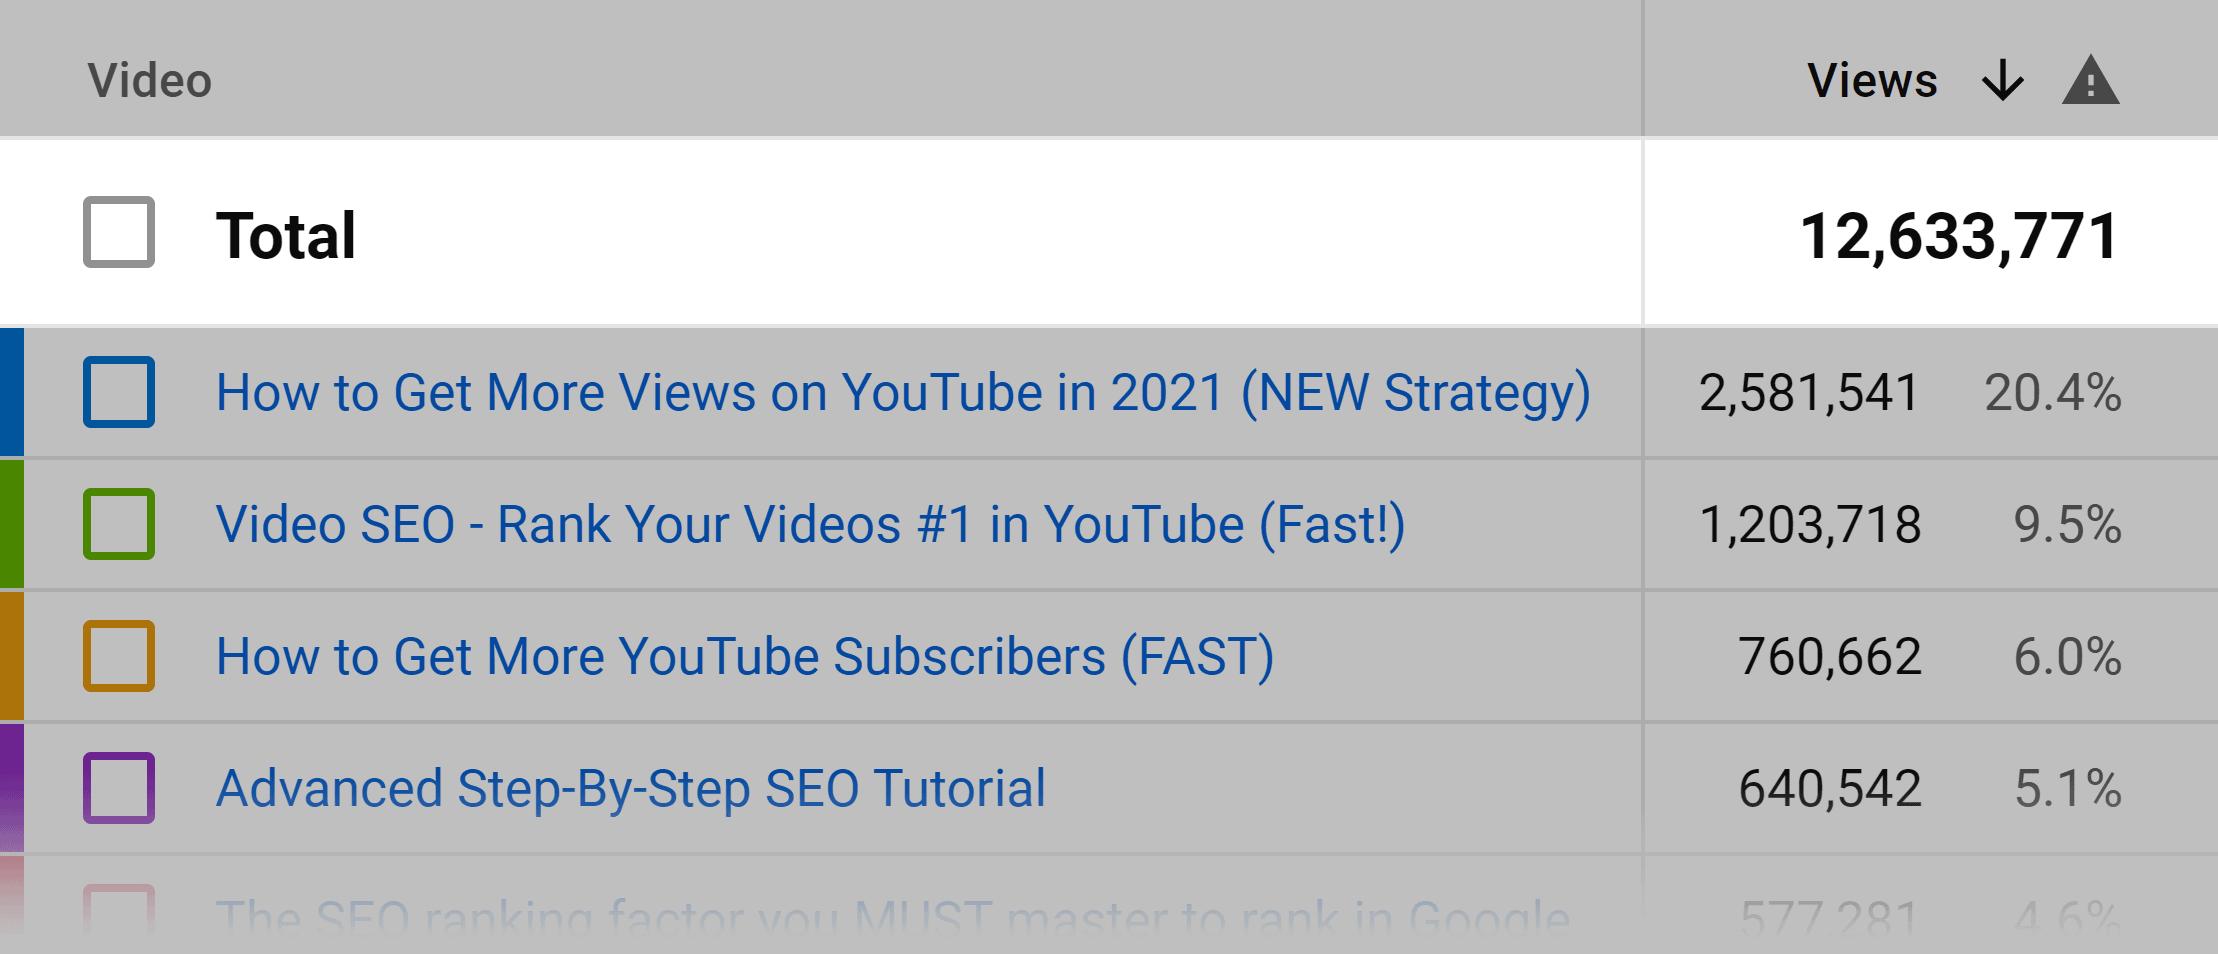 Backlinko YouTube – Total video views